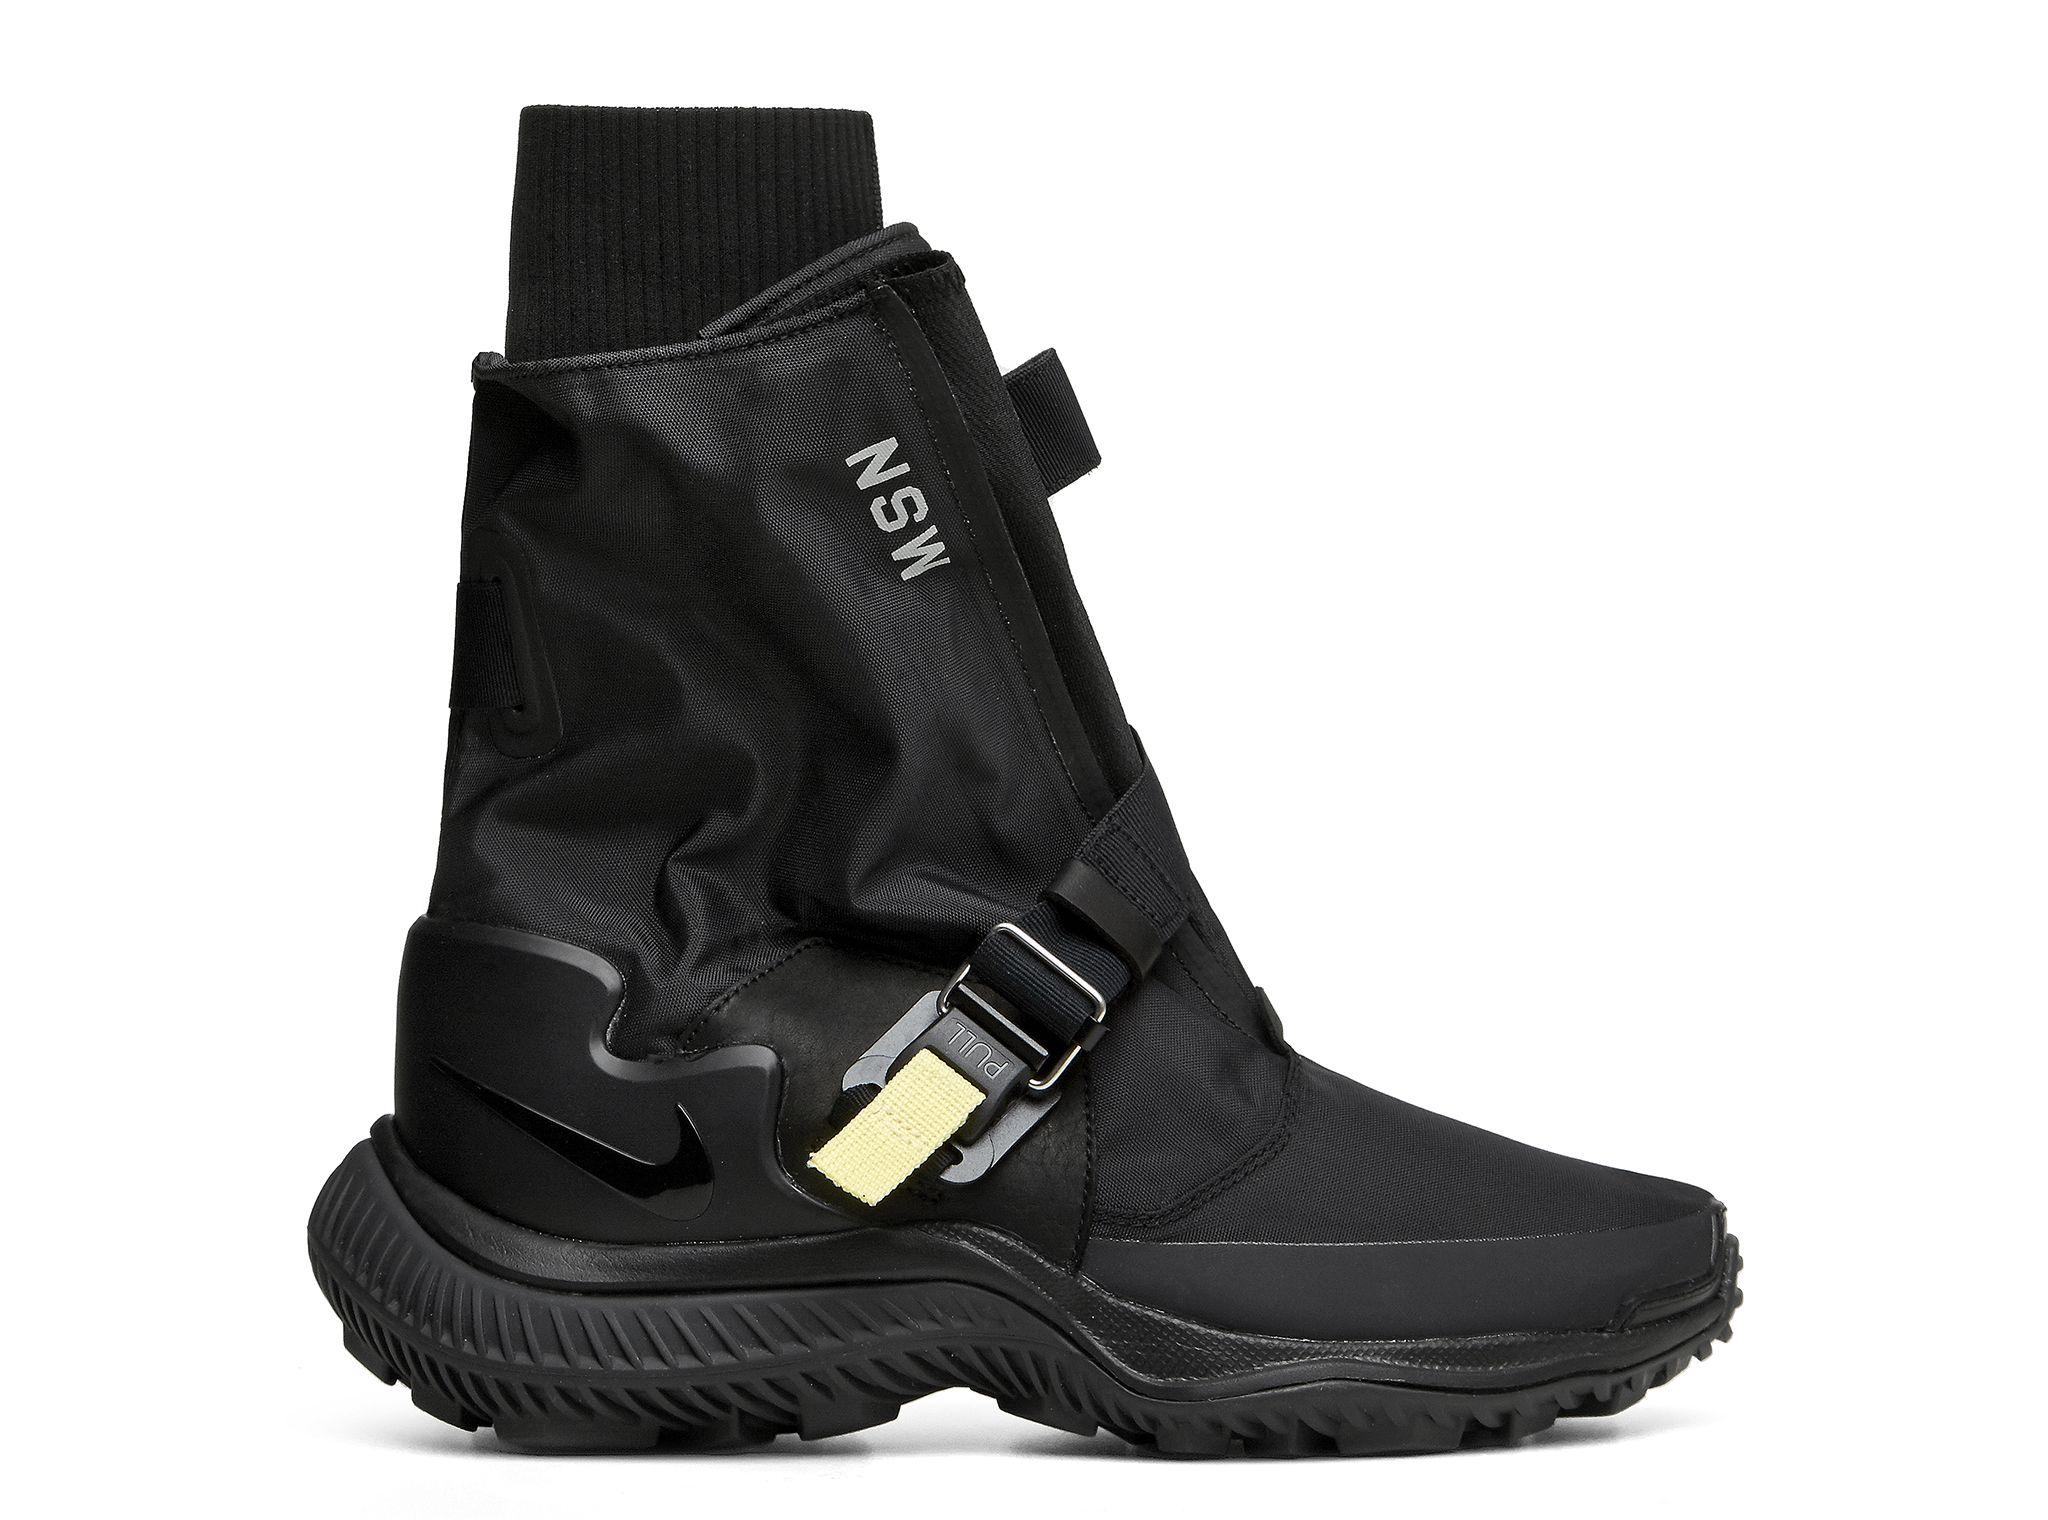 the latest 8c60f 4785c Nikelab x Gyakusou Wmns Gaiter Boot - Sneakerboy